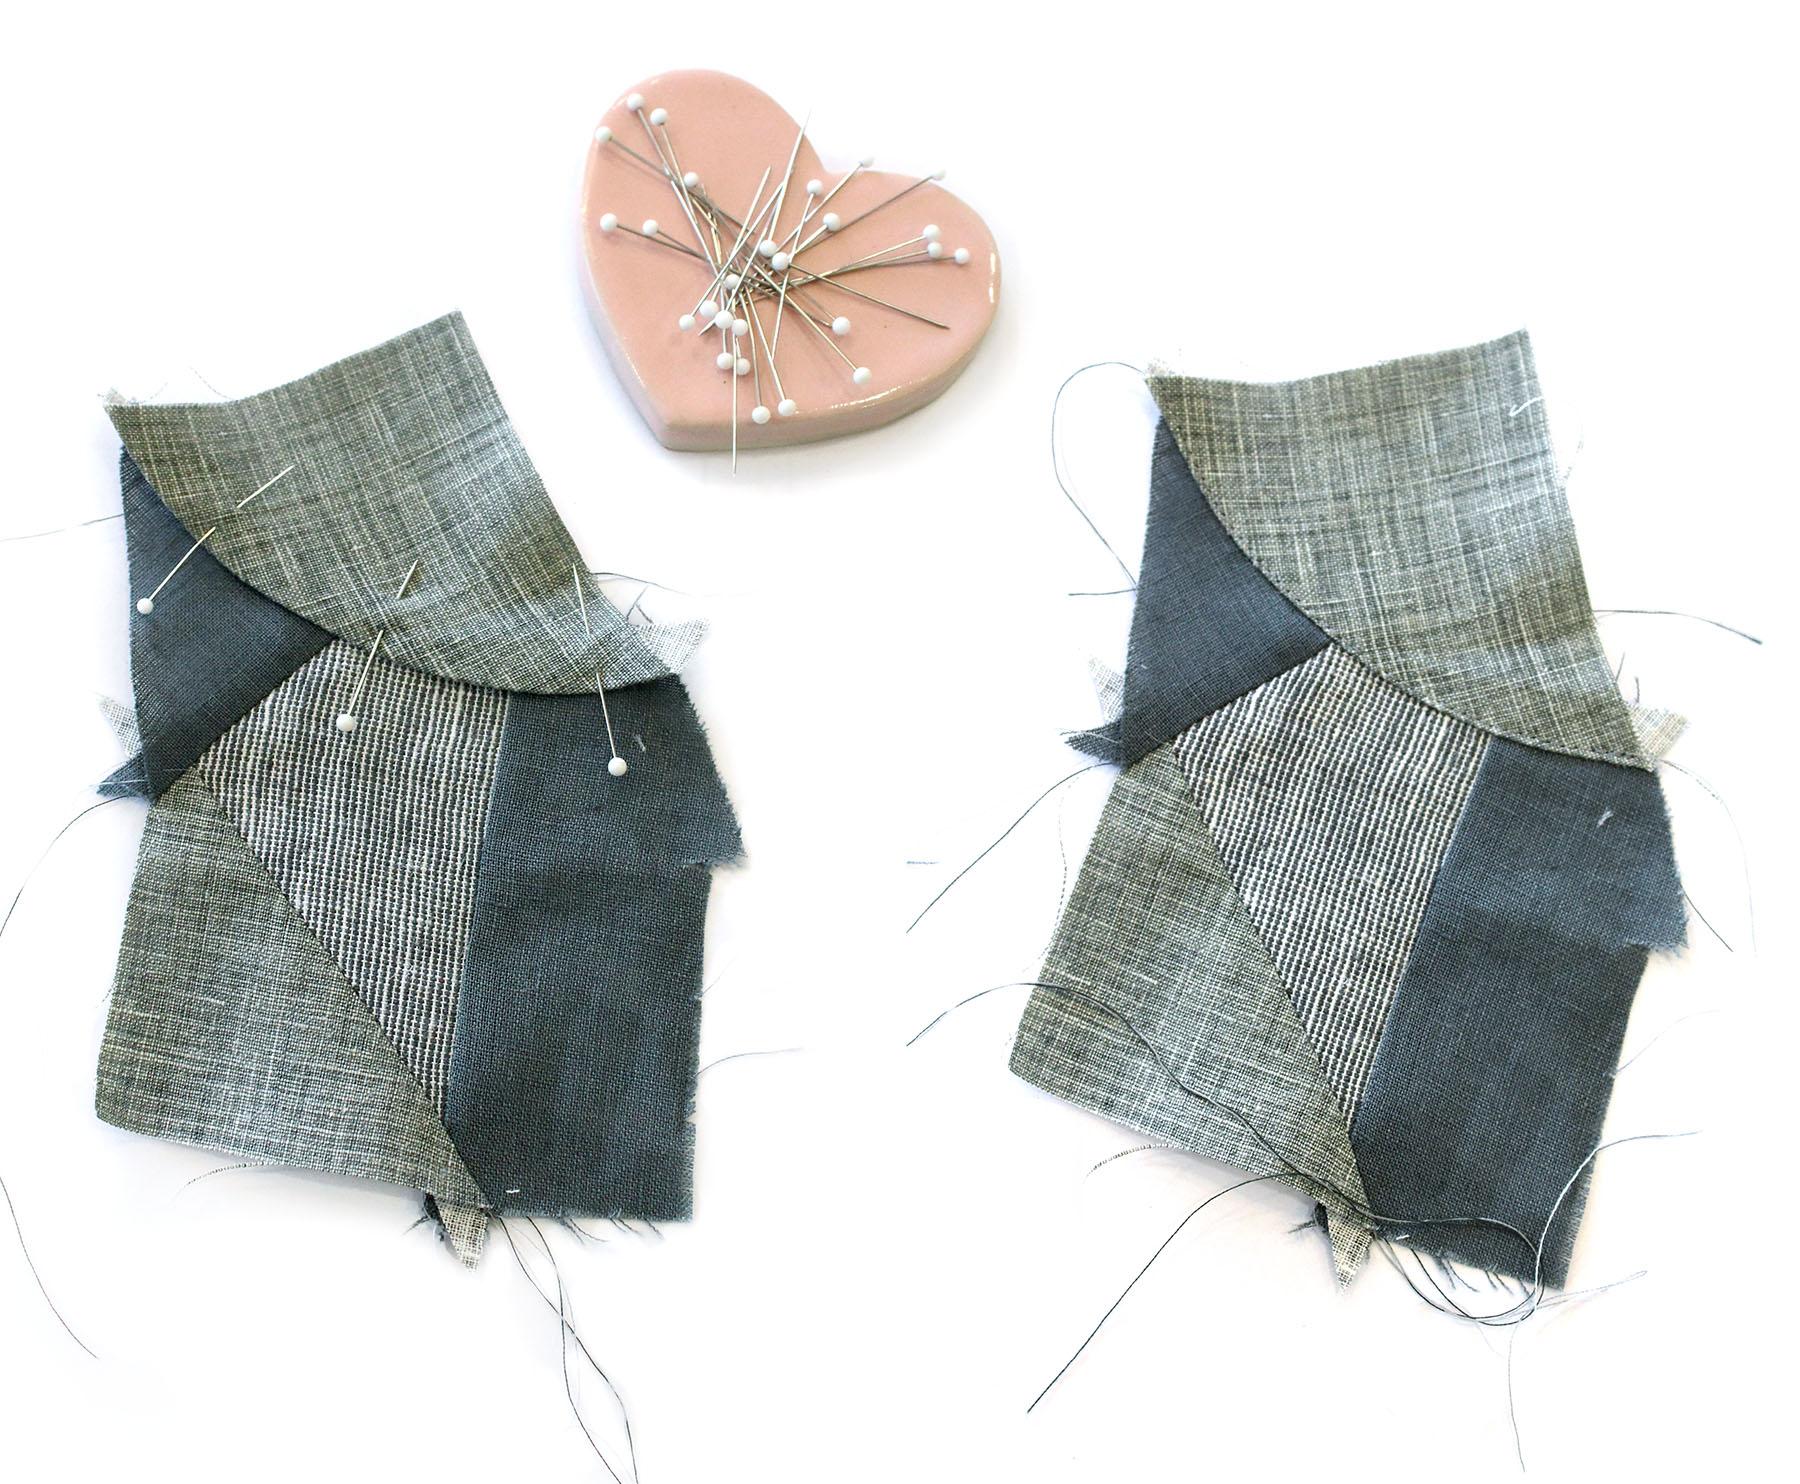 Megan Nielsen Patterns | Hovea Sewalong: Scrap Quilting | Curve Seams - Top Stitching Your Applique Piece In Place